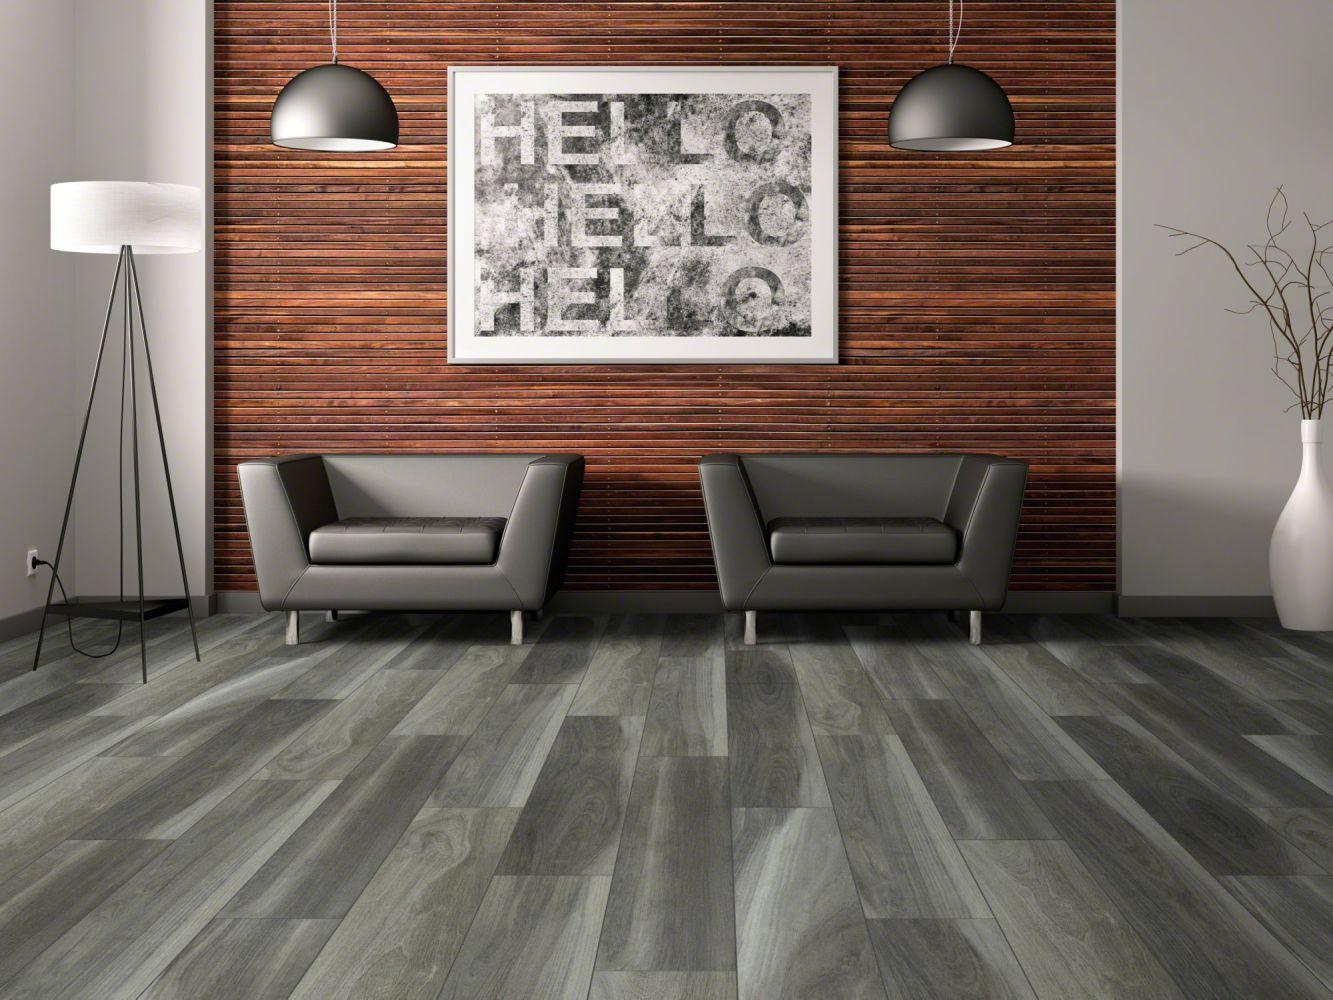 Shaw Floors Vinyl Residential Intrepid HD Plus Charred Oak 05009_2024V